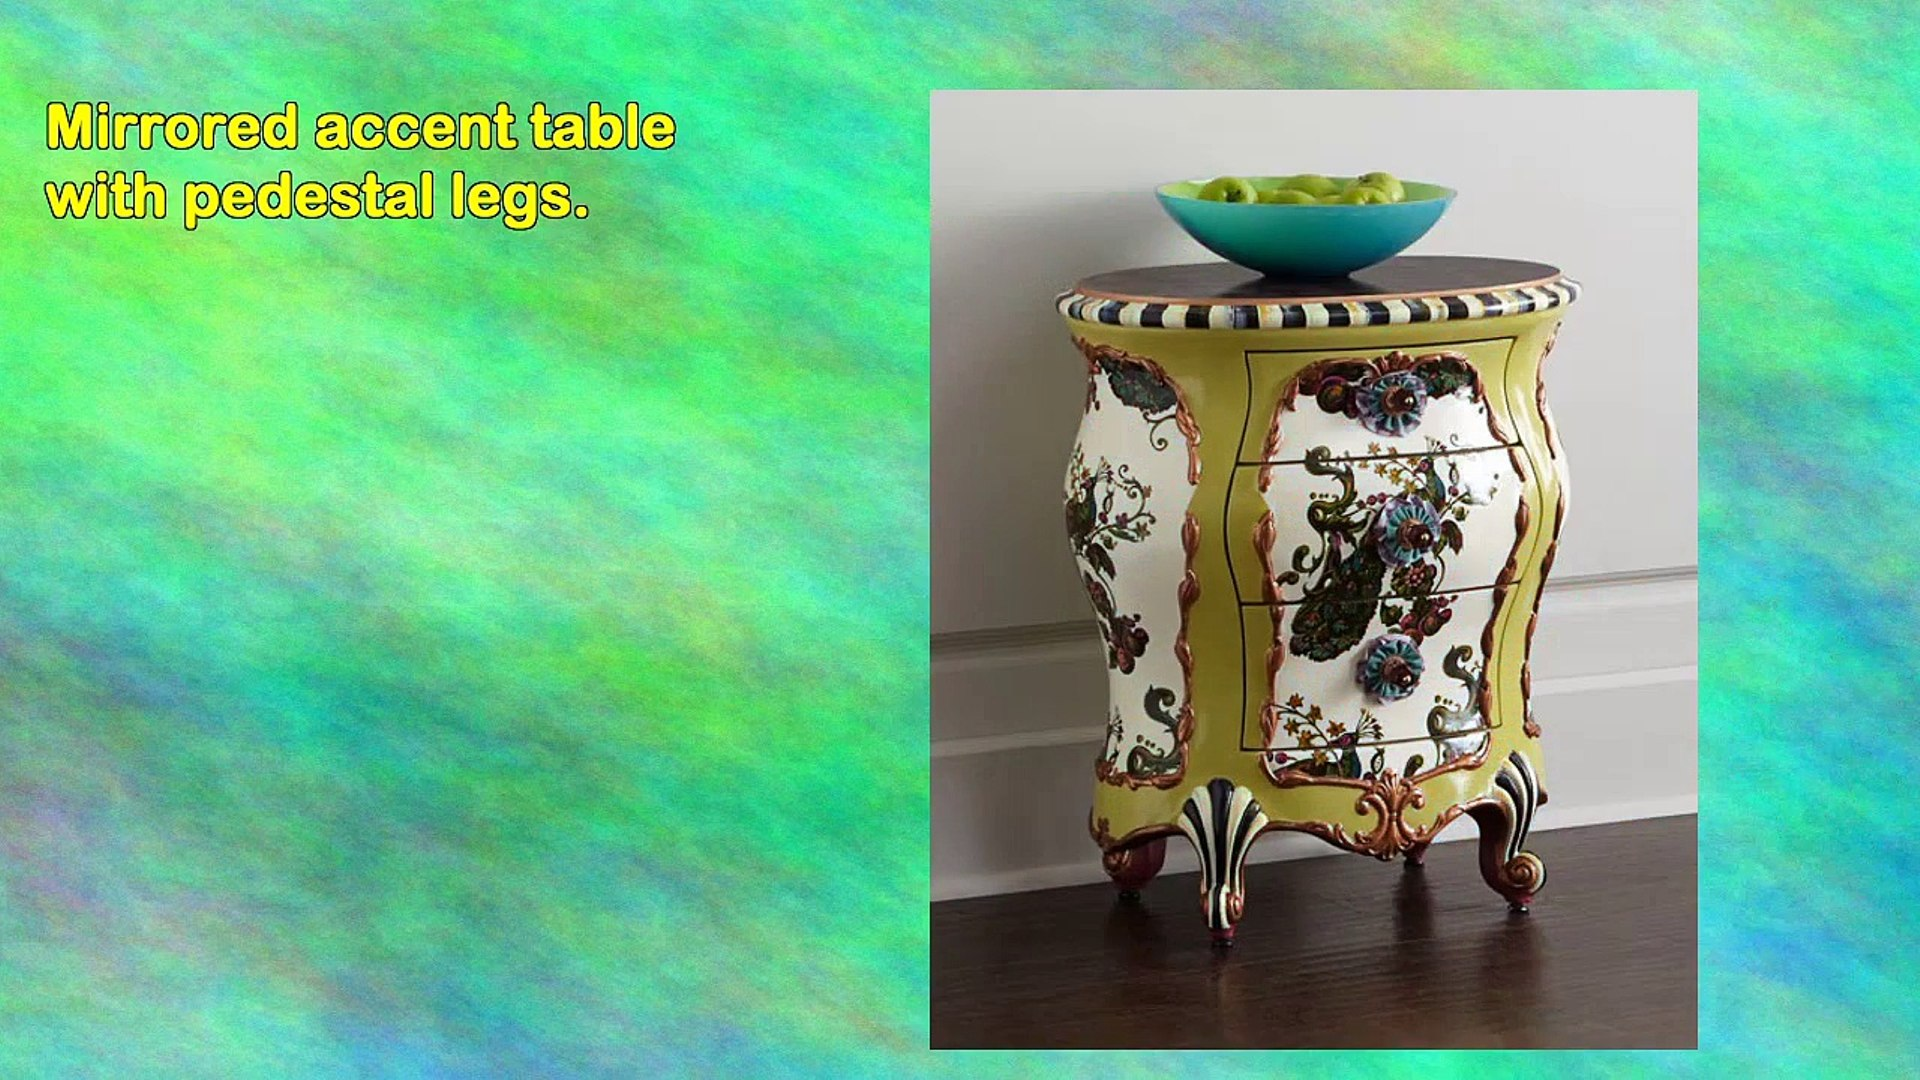 mackenzie mirror accent table video dailymotion kks mirrored kettler garden furniture annie sloan provence outdoor side beverage cooler grey metal west elm bookshelf fabric